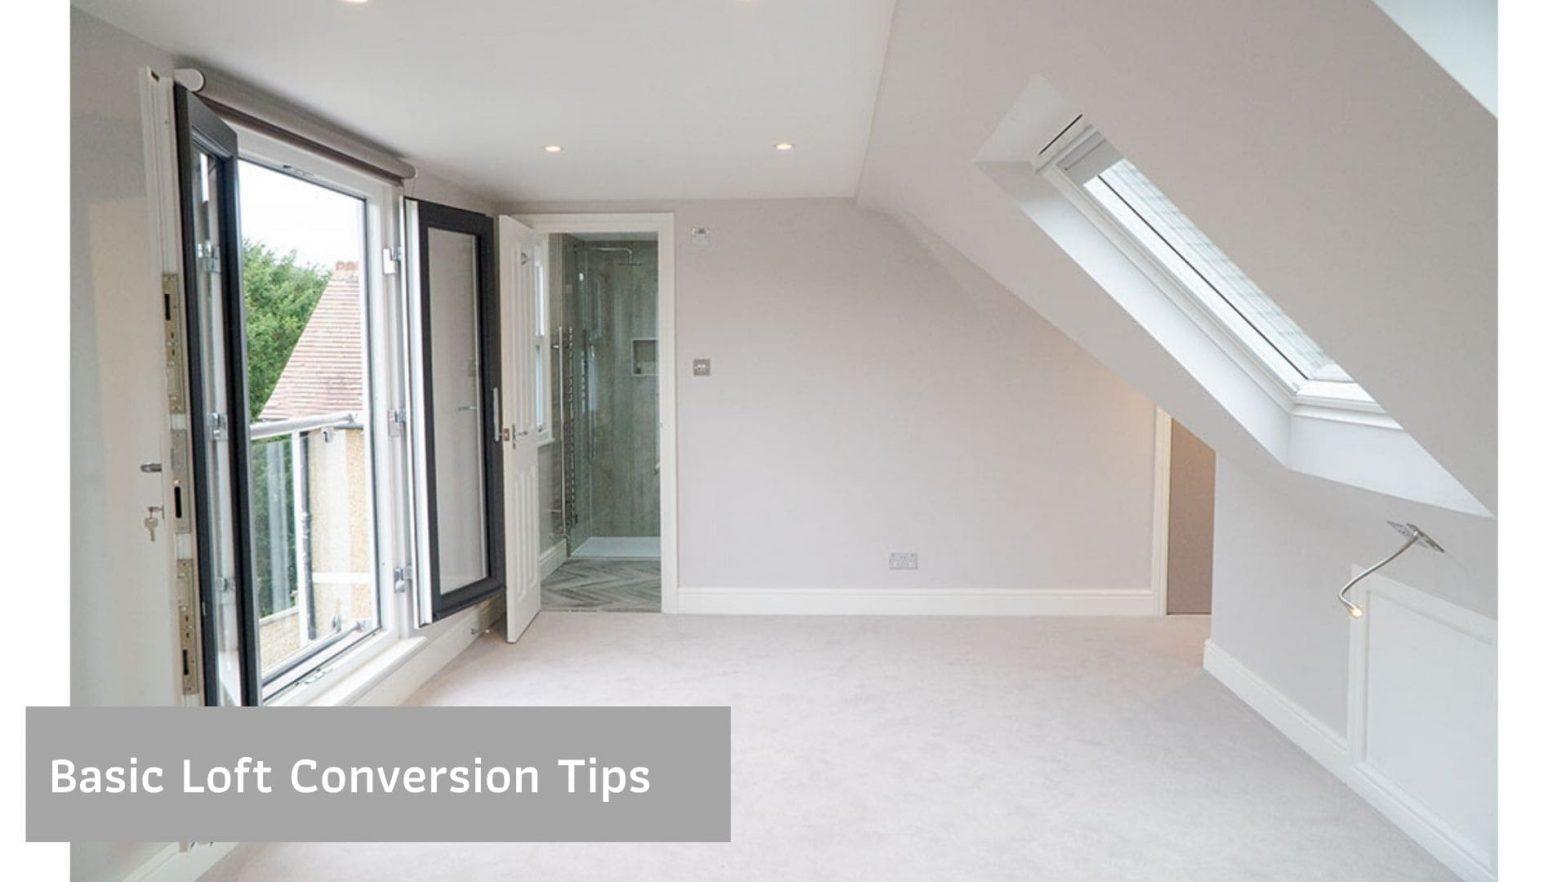 Basic Loft Conversion Tips